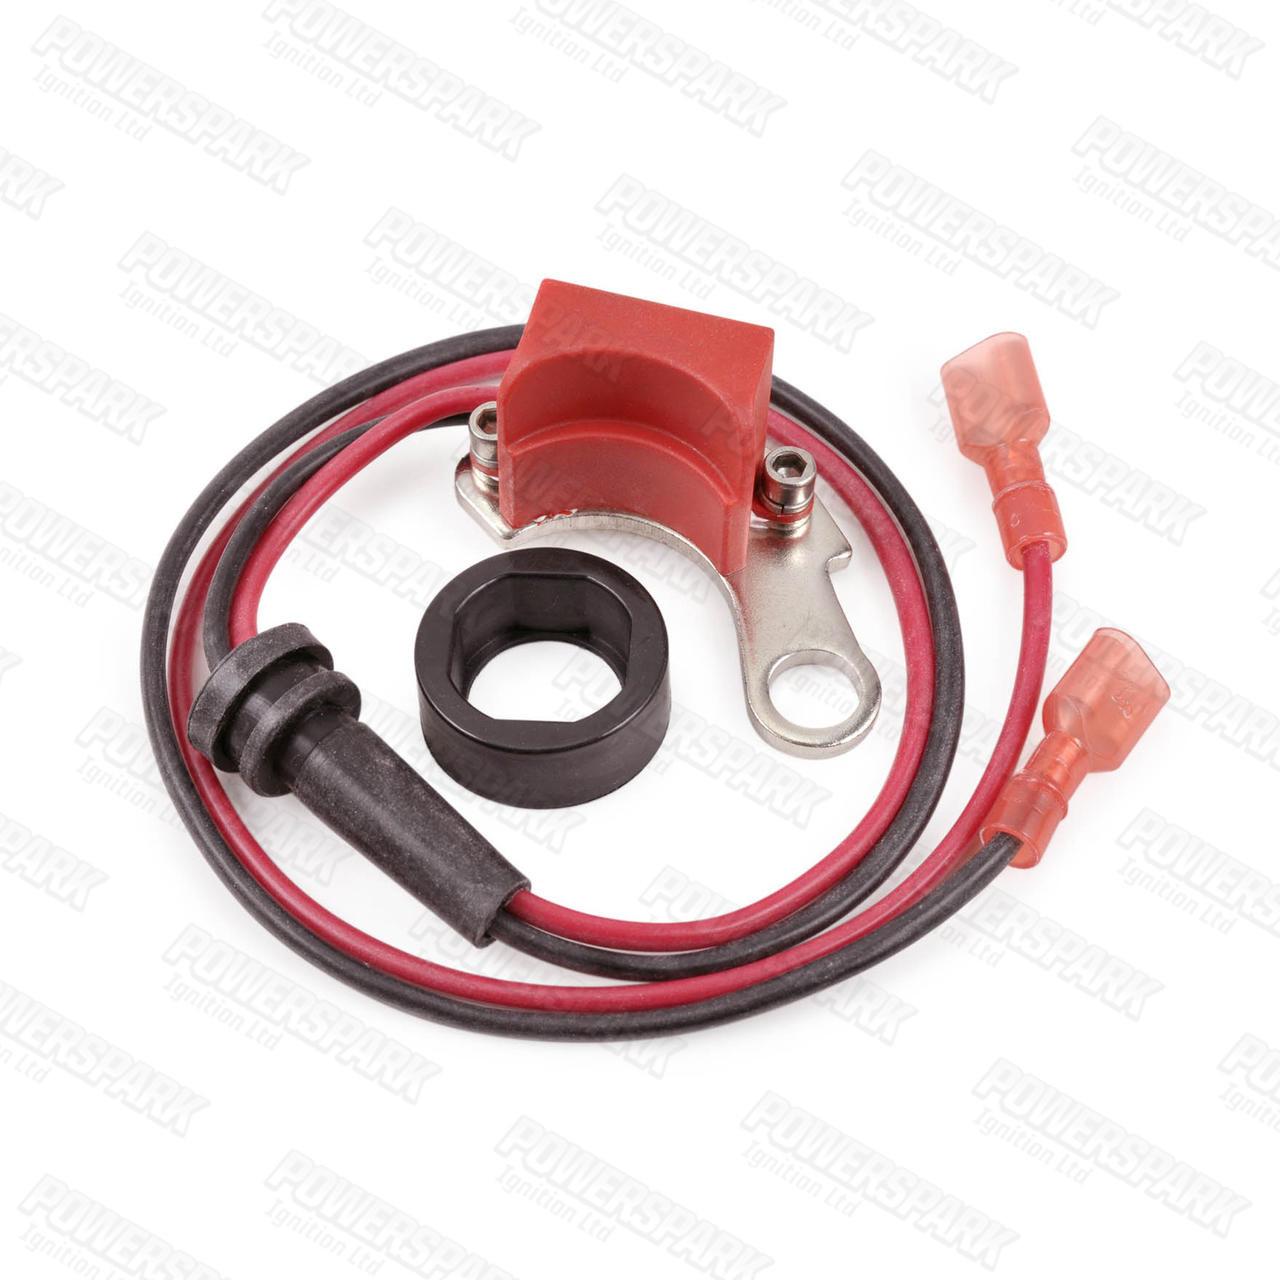 Powerspark Powerspark Electronic Ignition Kit for Bosch 4 Cyl RH 2PC Distributor K14